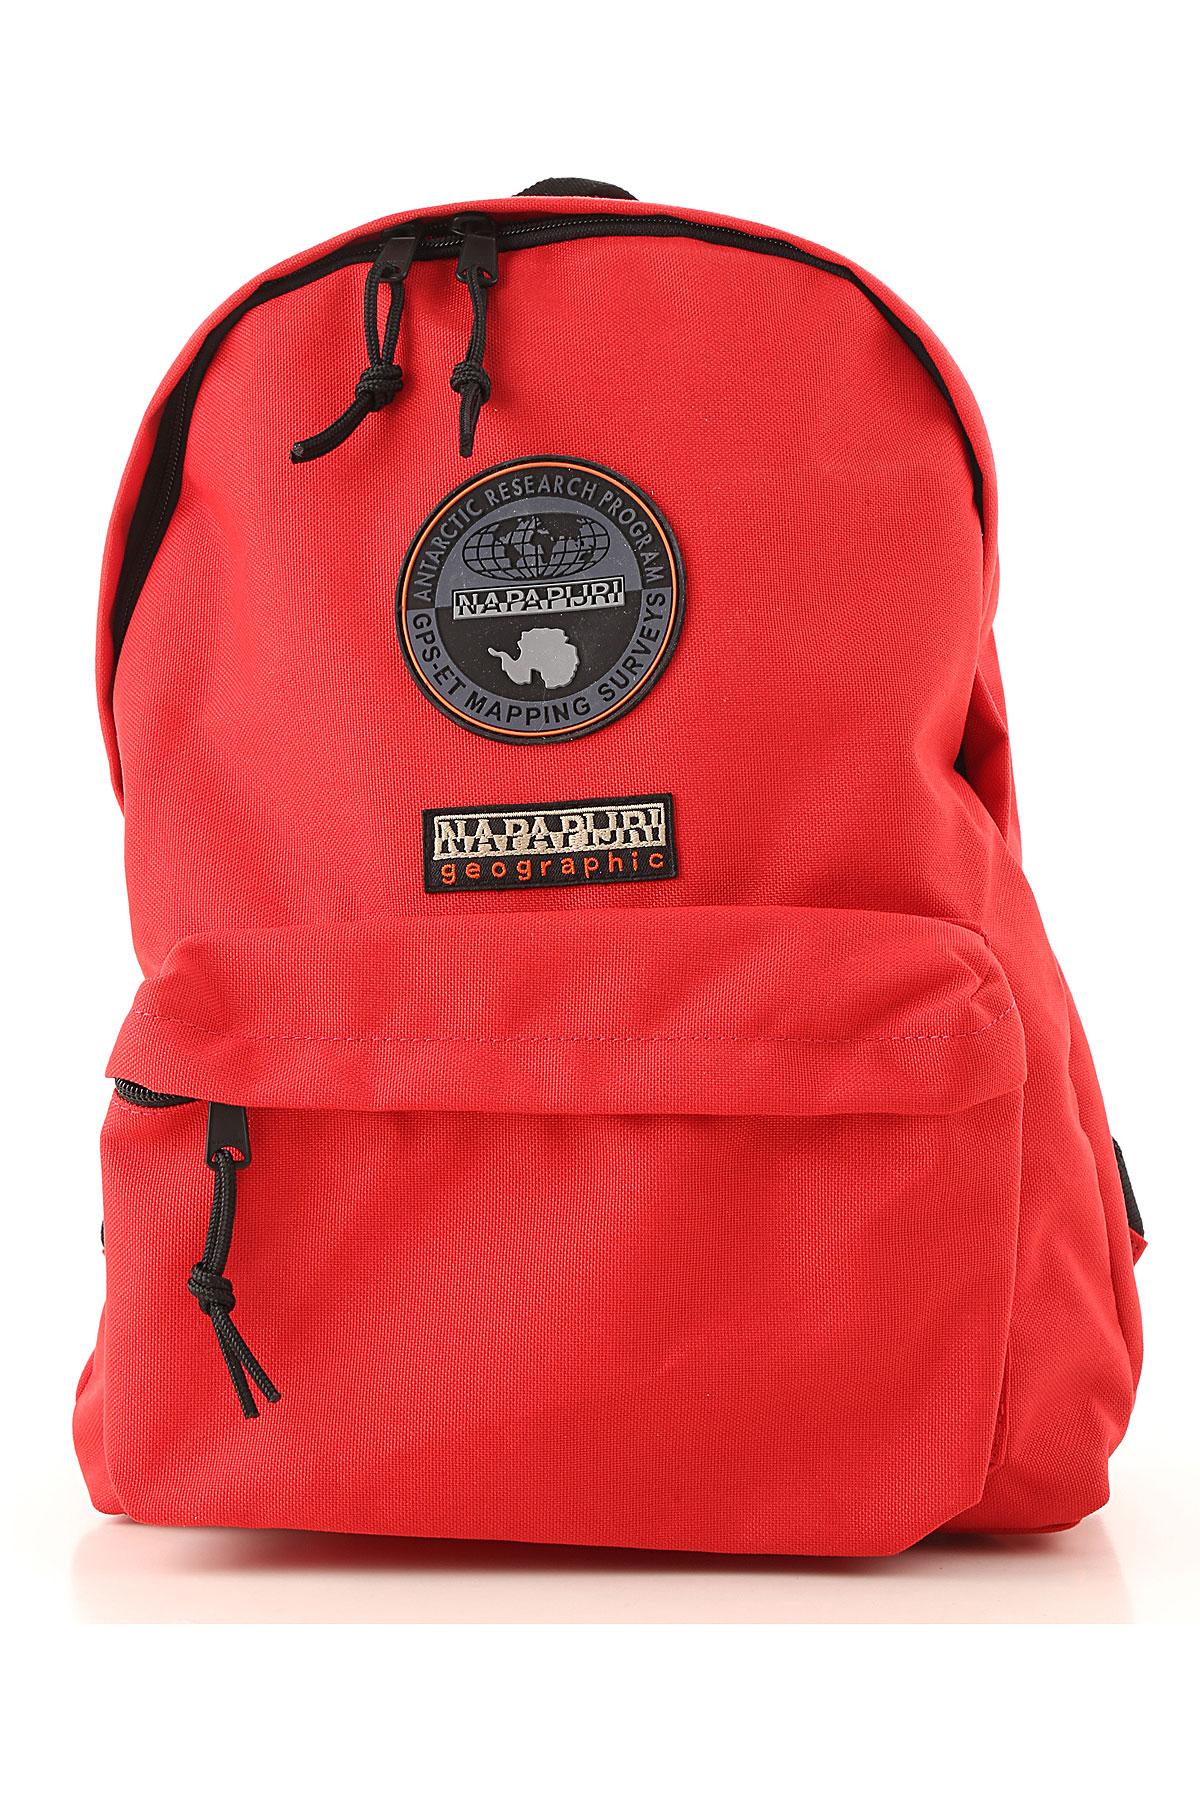 Image of Napapijri Backpack for Women, Red, Fabric, 2017